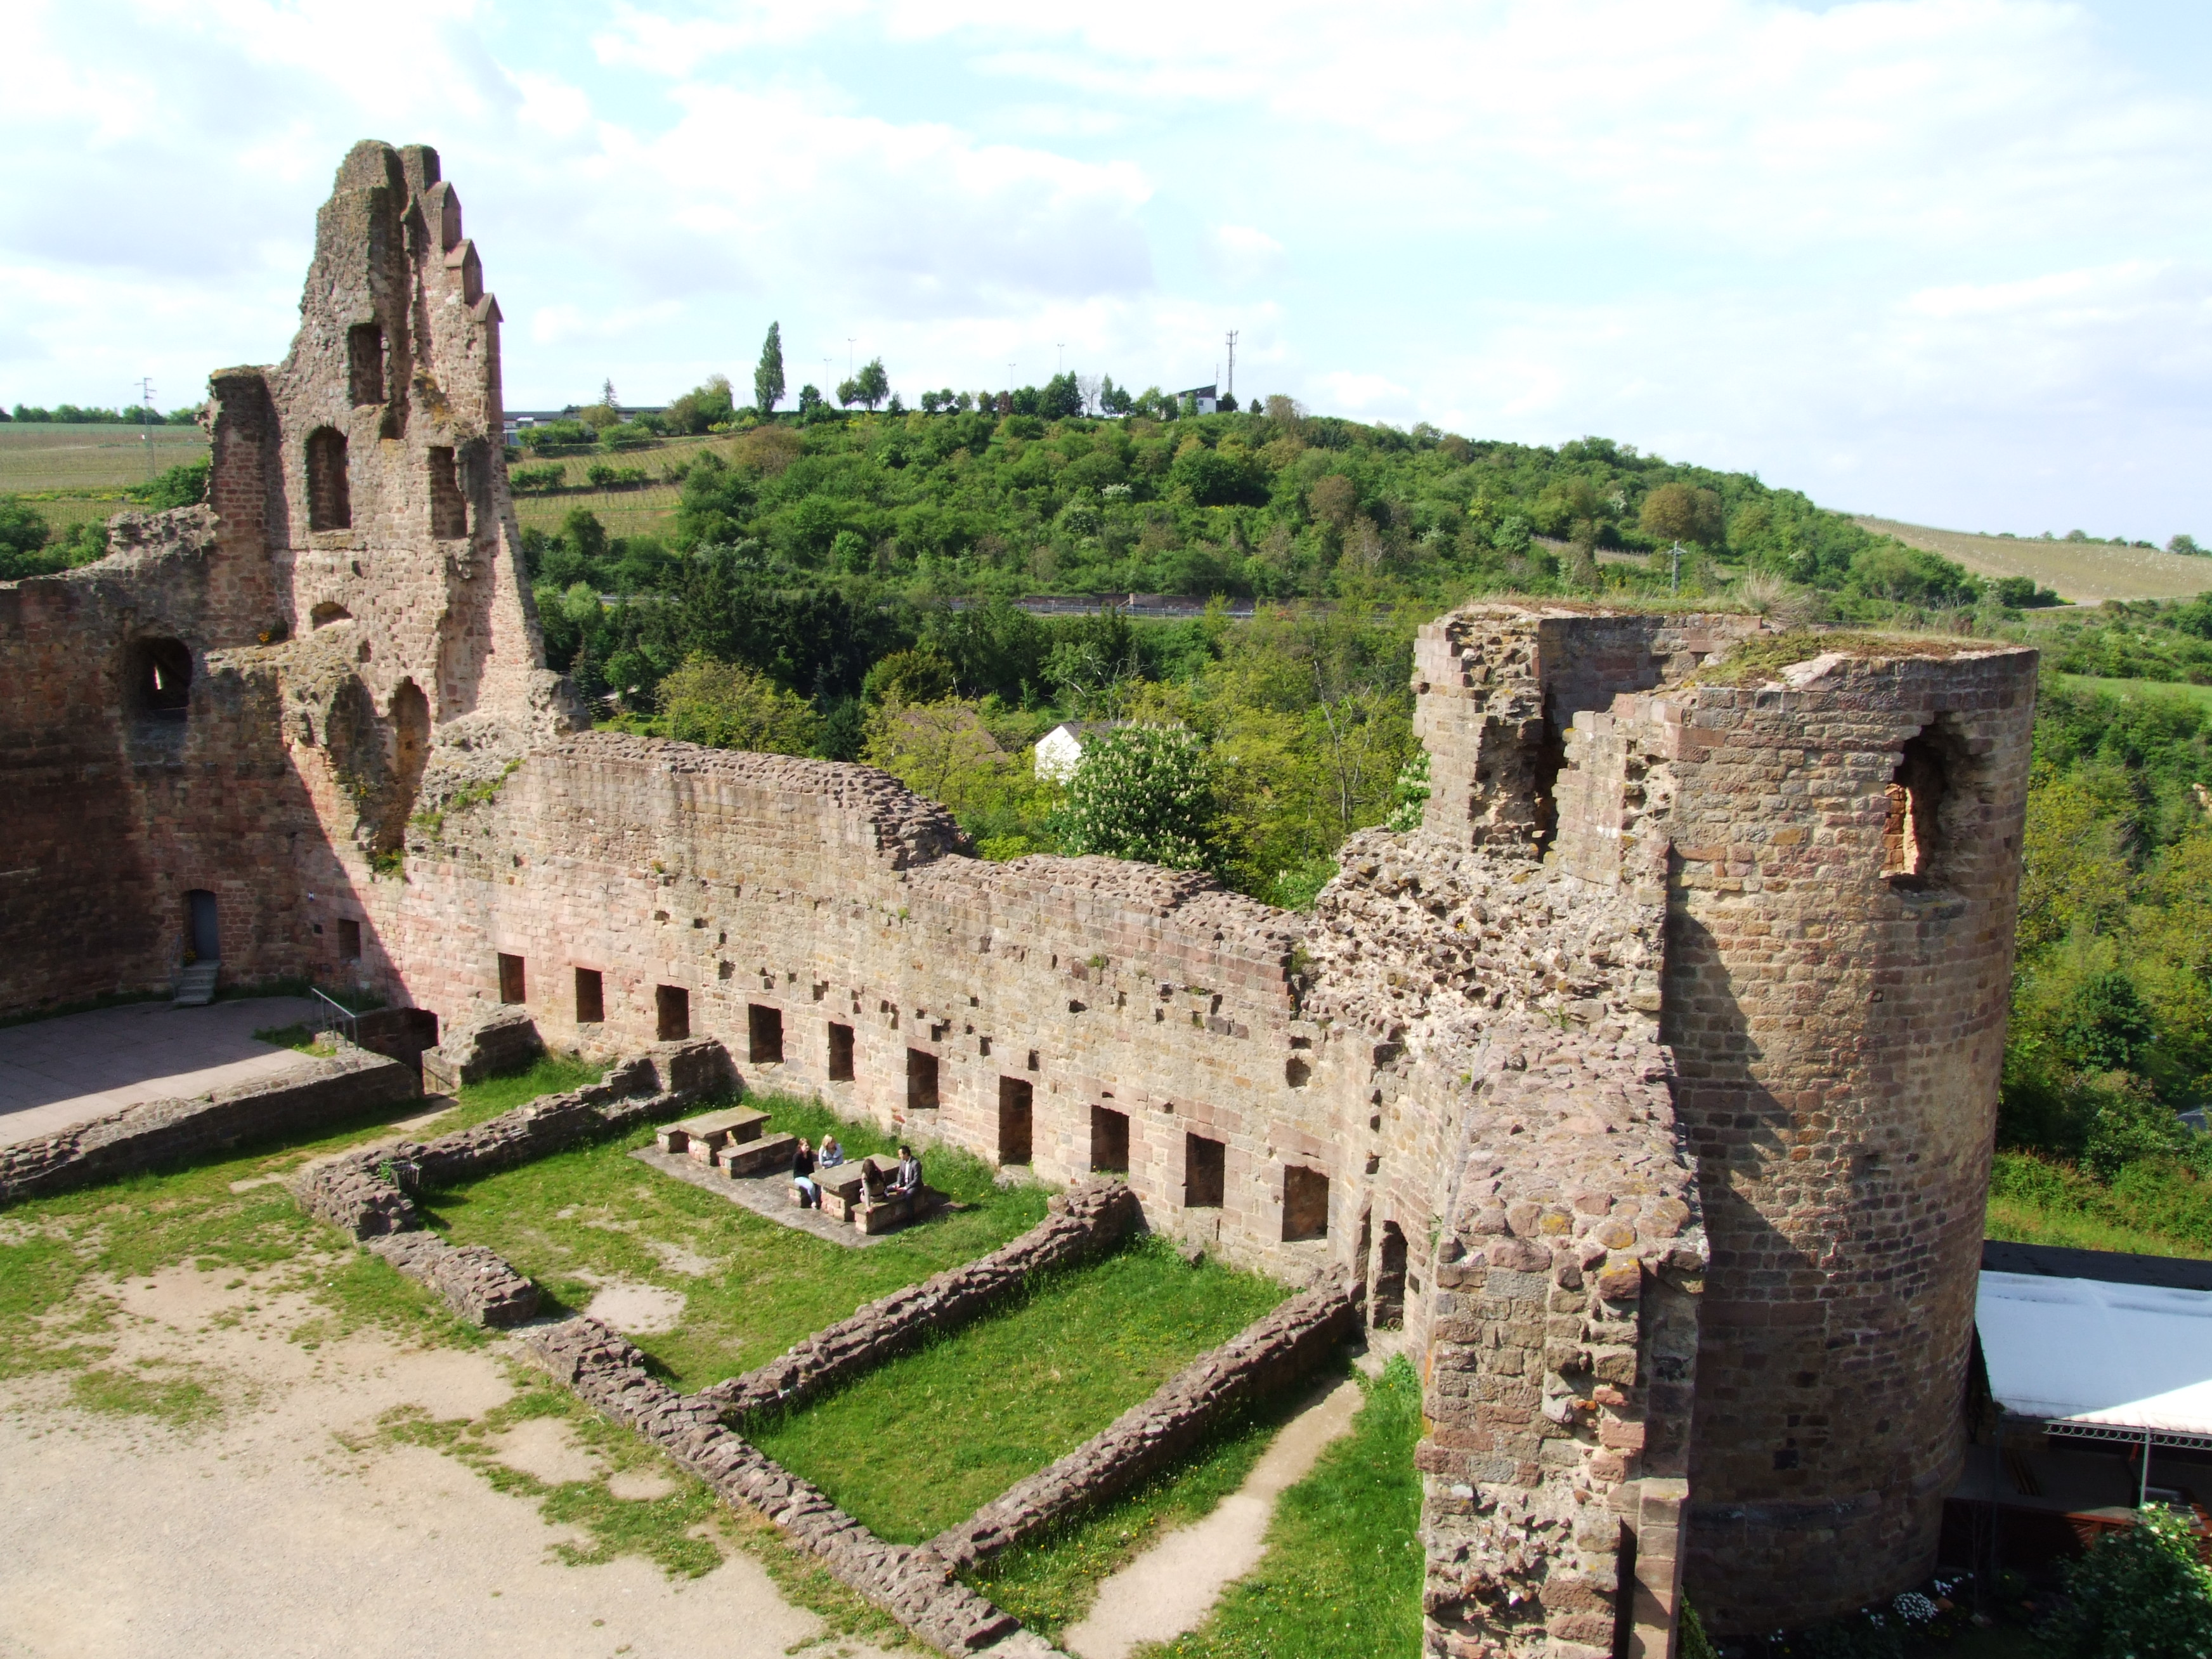 Datei:Burg Neuleiningen, Nordseite.JPG – Wikipedia